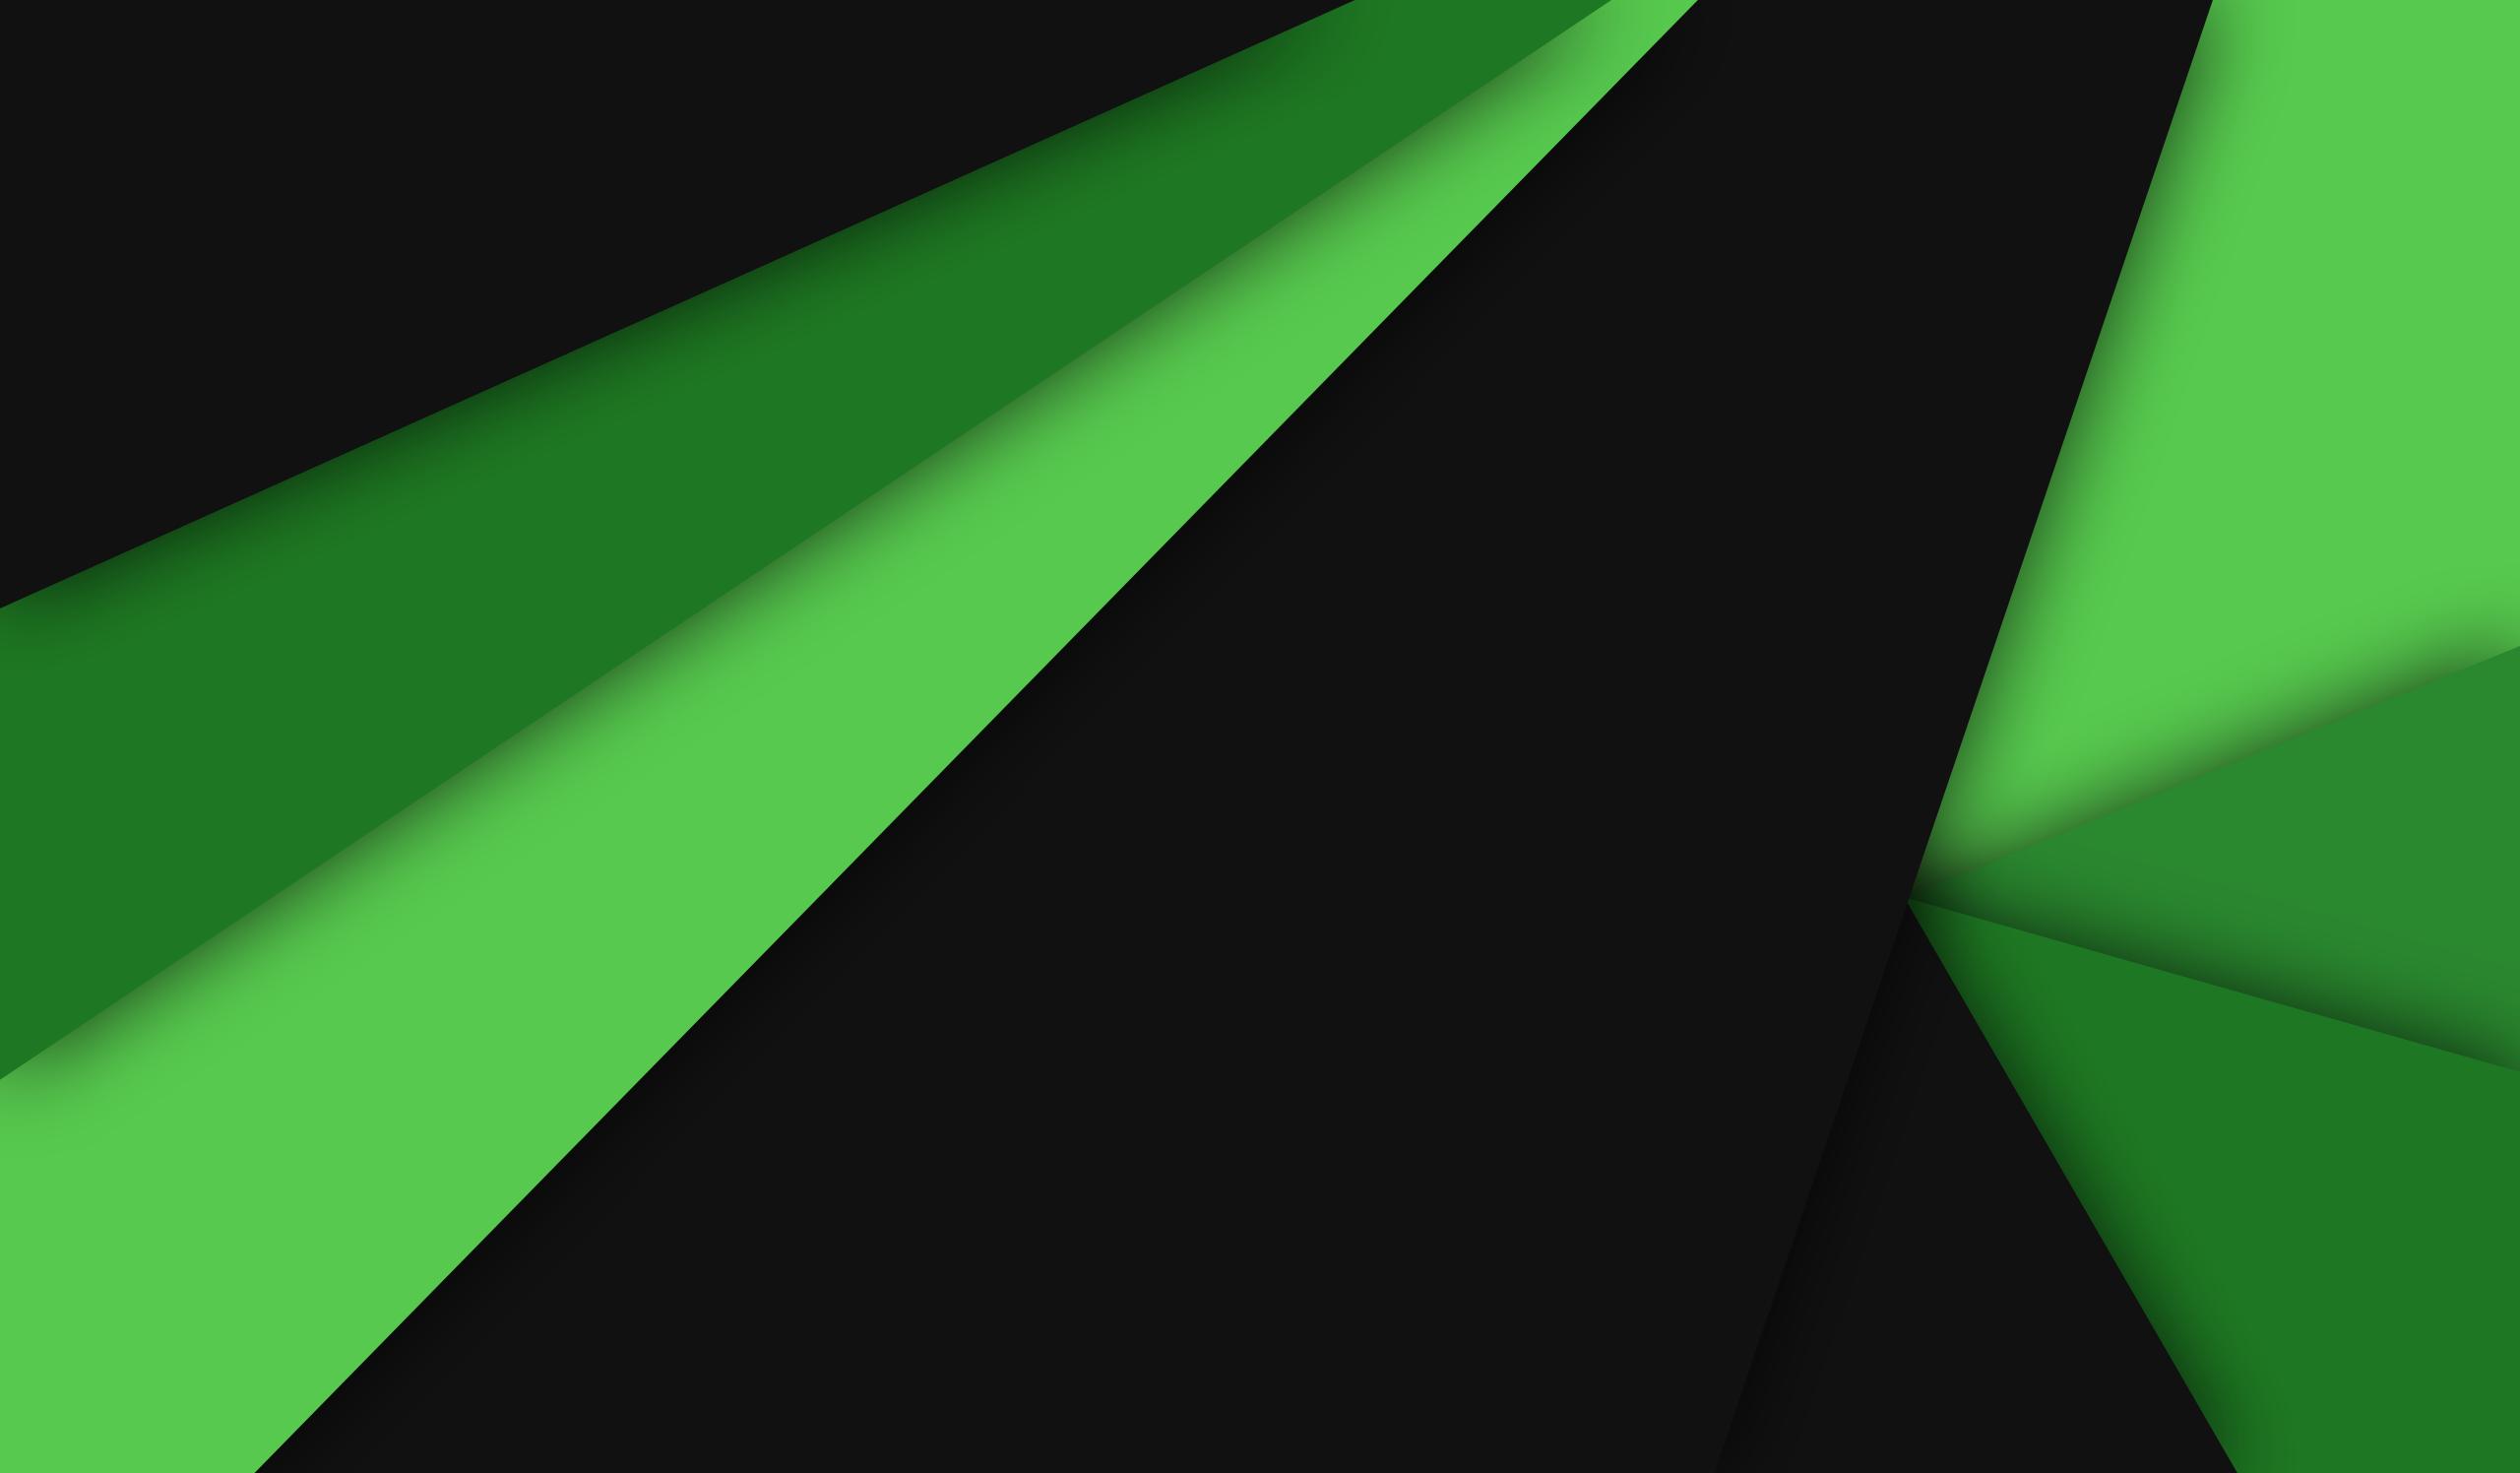 [XFCE] My work in progress Arch setup. : unixporn